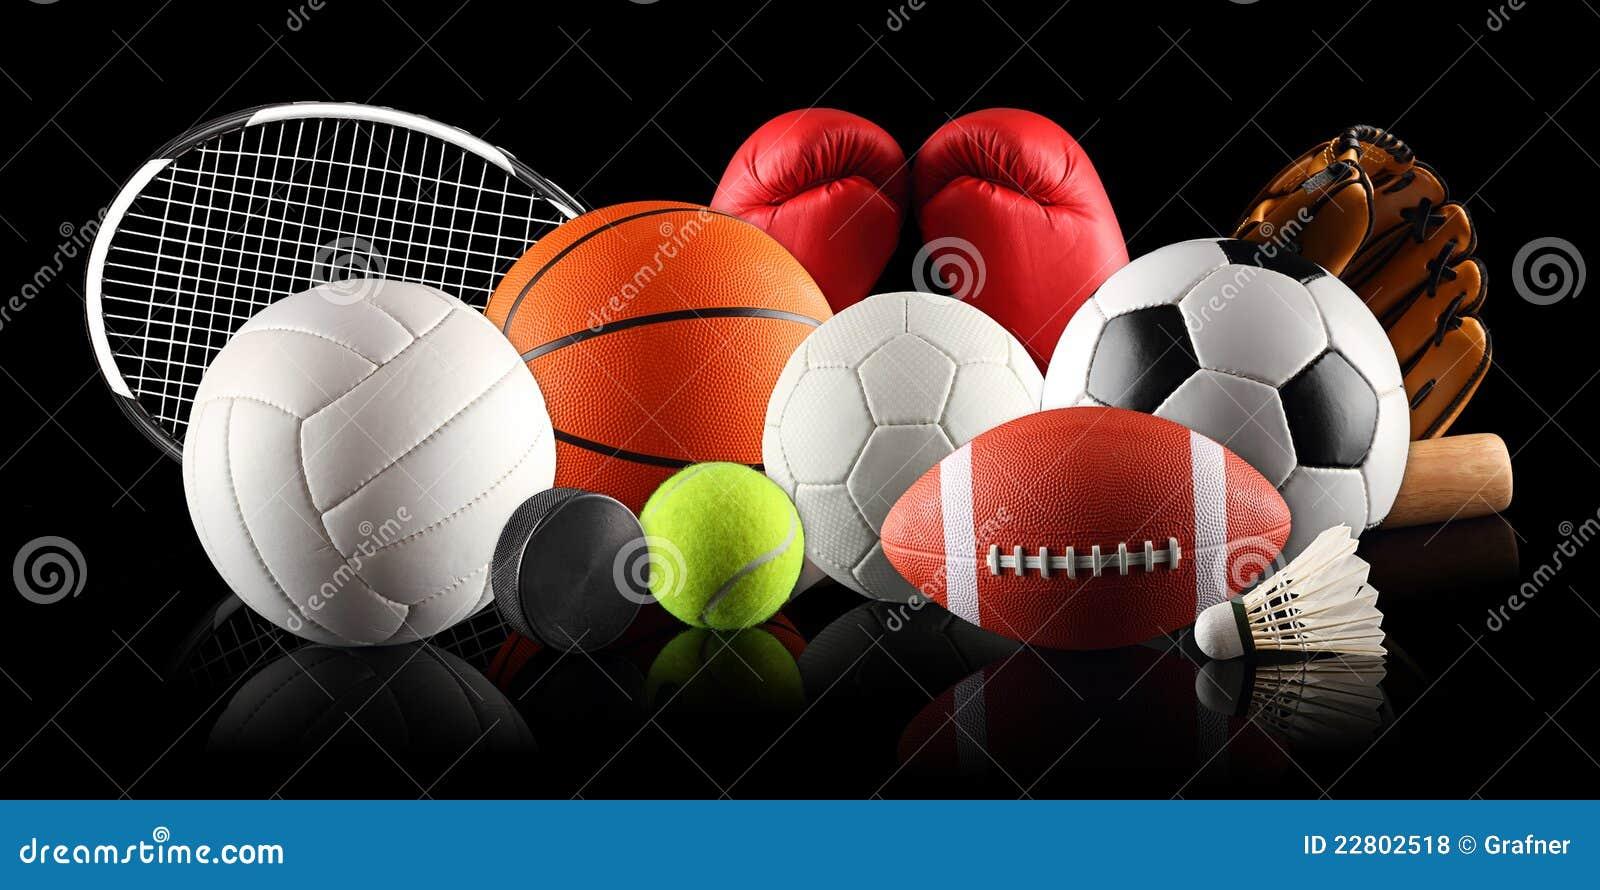 c-date erfaringer sport date